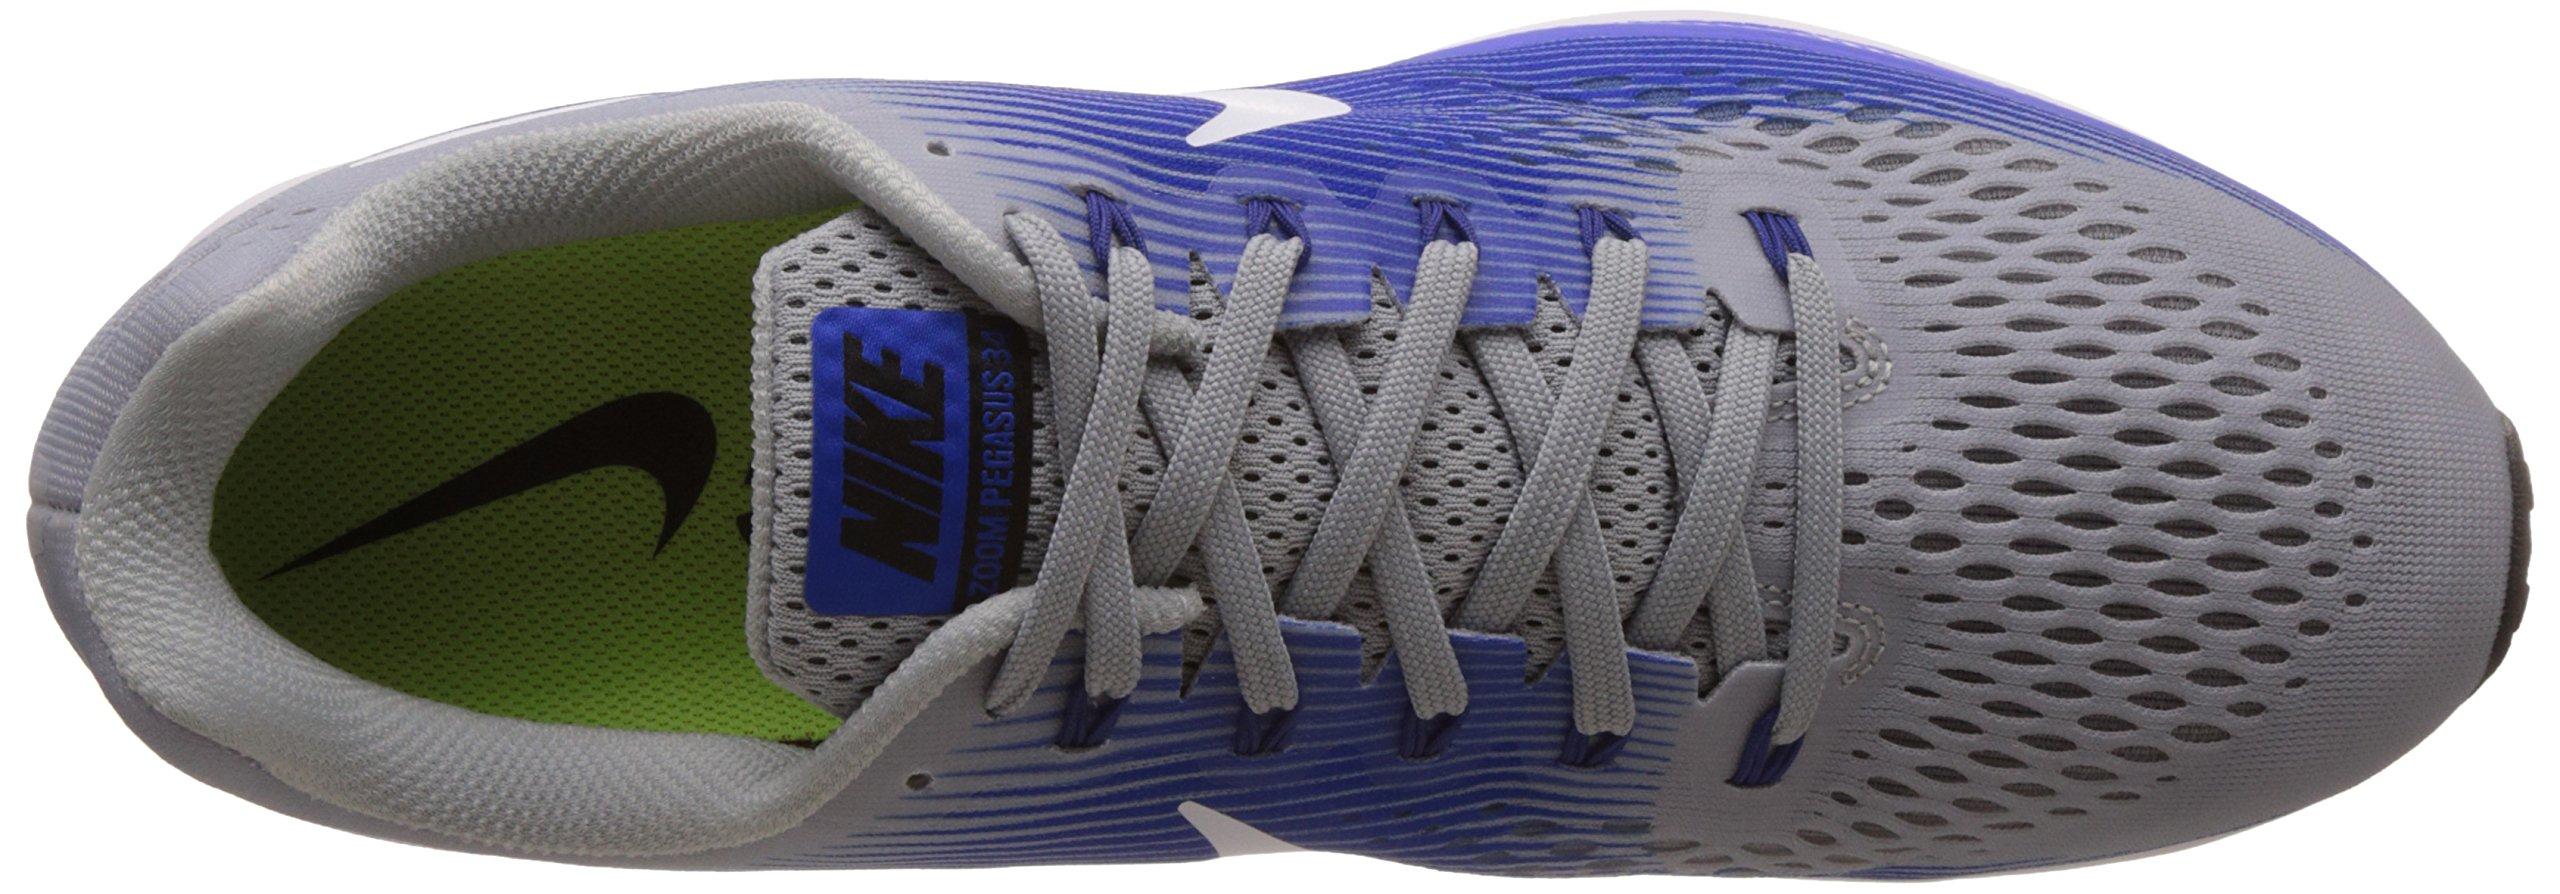 NIKE Mens Air Zoom Pegasus 34 Running Shoe (11 M US, Wolf Grey/White/Racer Blue) by Nike (Image #7)